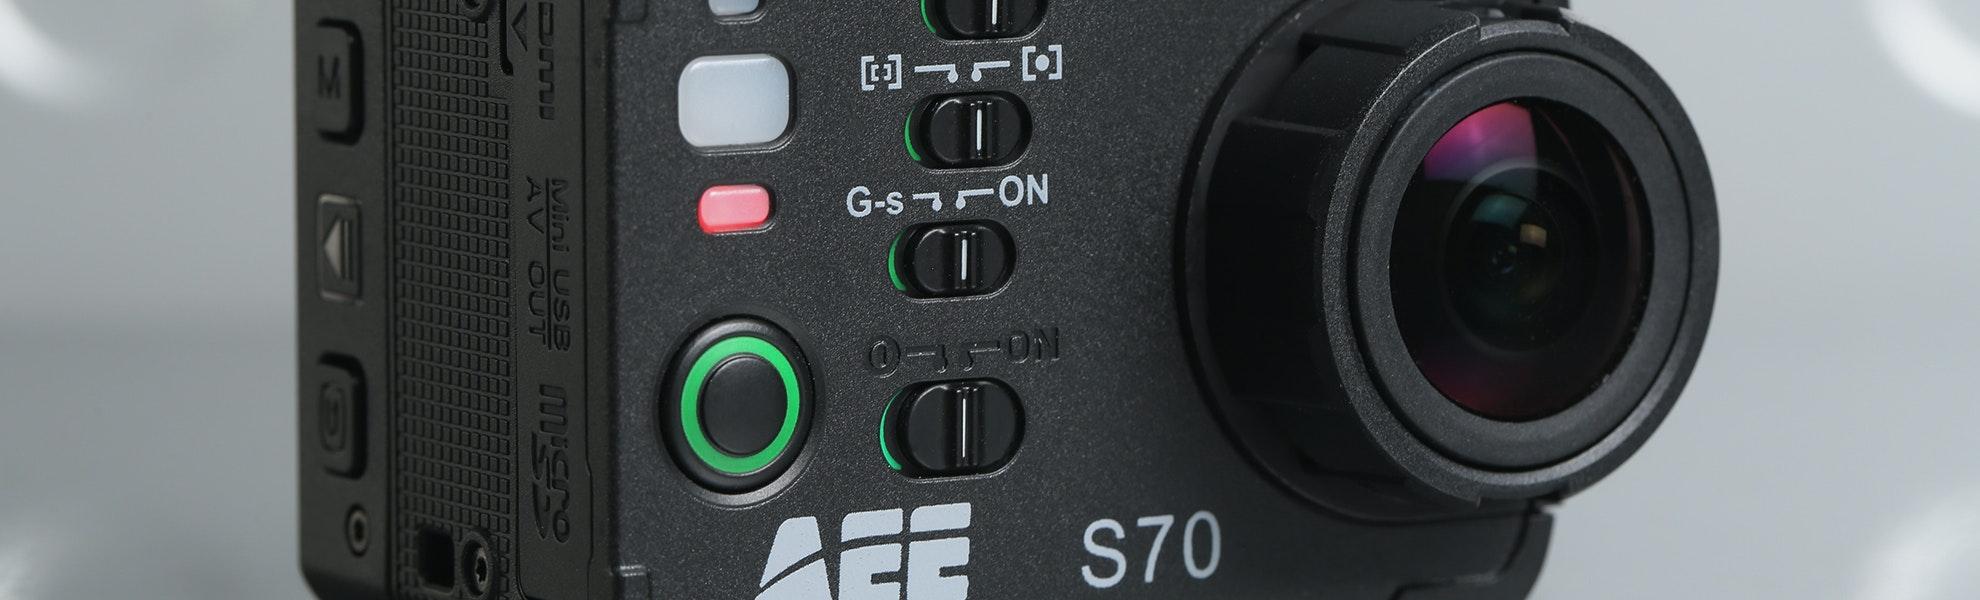 AEE S70 Waterproof Action Camera